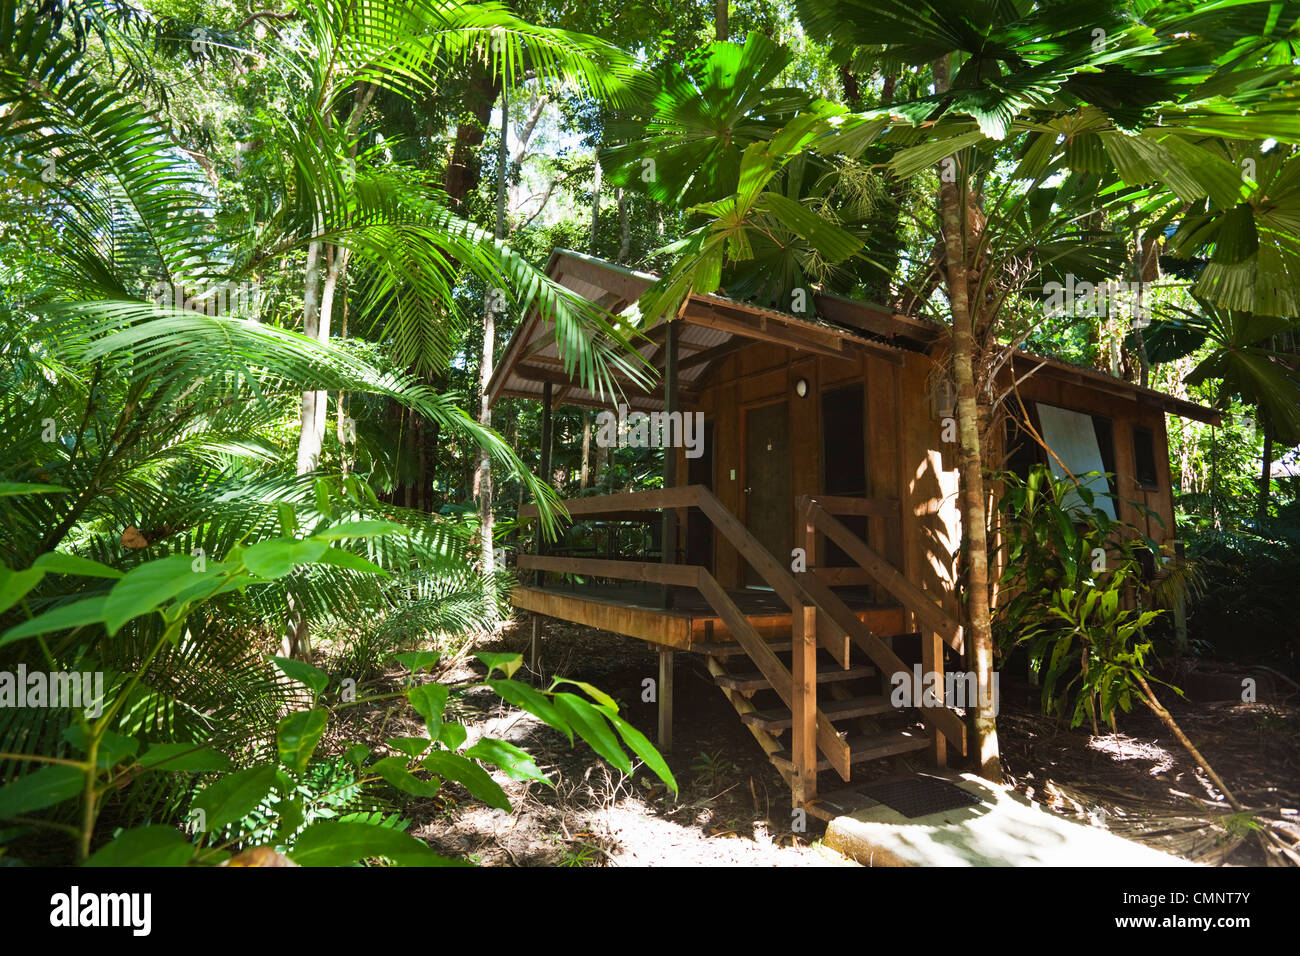 Rainforest cabin at PK's Jungle Village. Cape Tribulation, Daintree National Park, Queensland, Australia - Stock Image